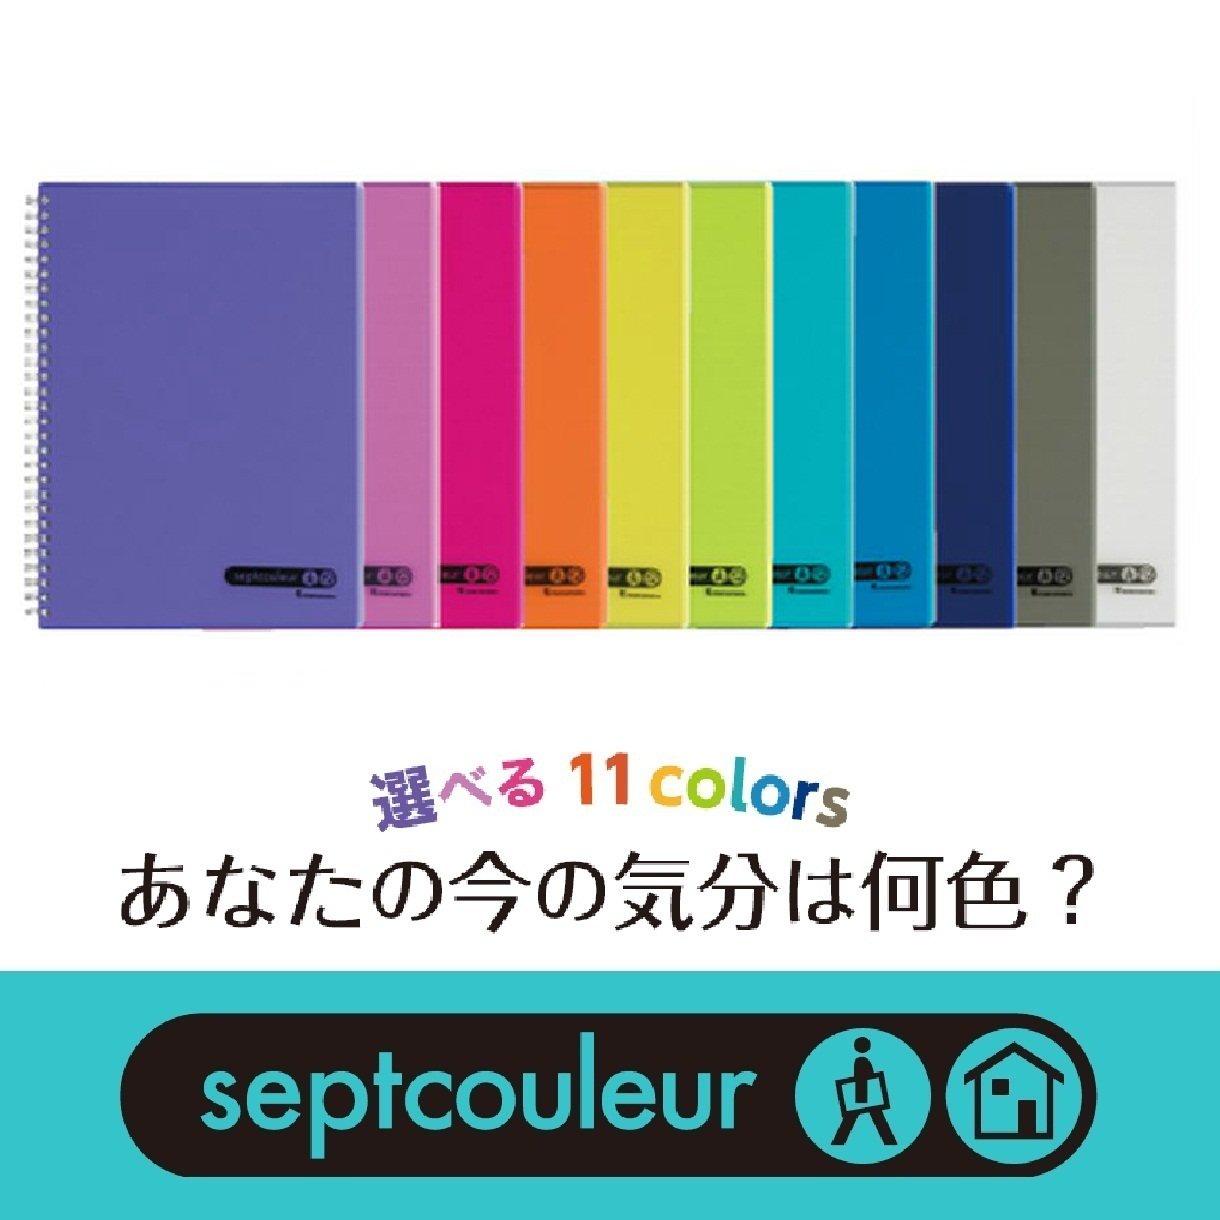 Maruman Lifetime Notebook B5 (6.9x9.8'') - 80 sheets - Light Blue by Maruman (Image #1)